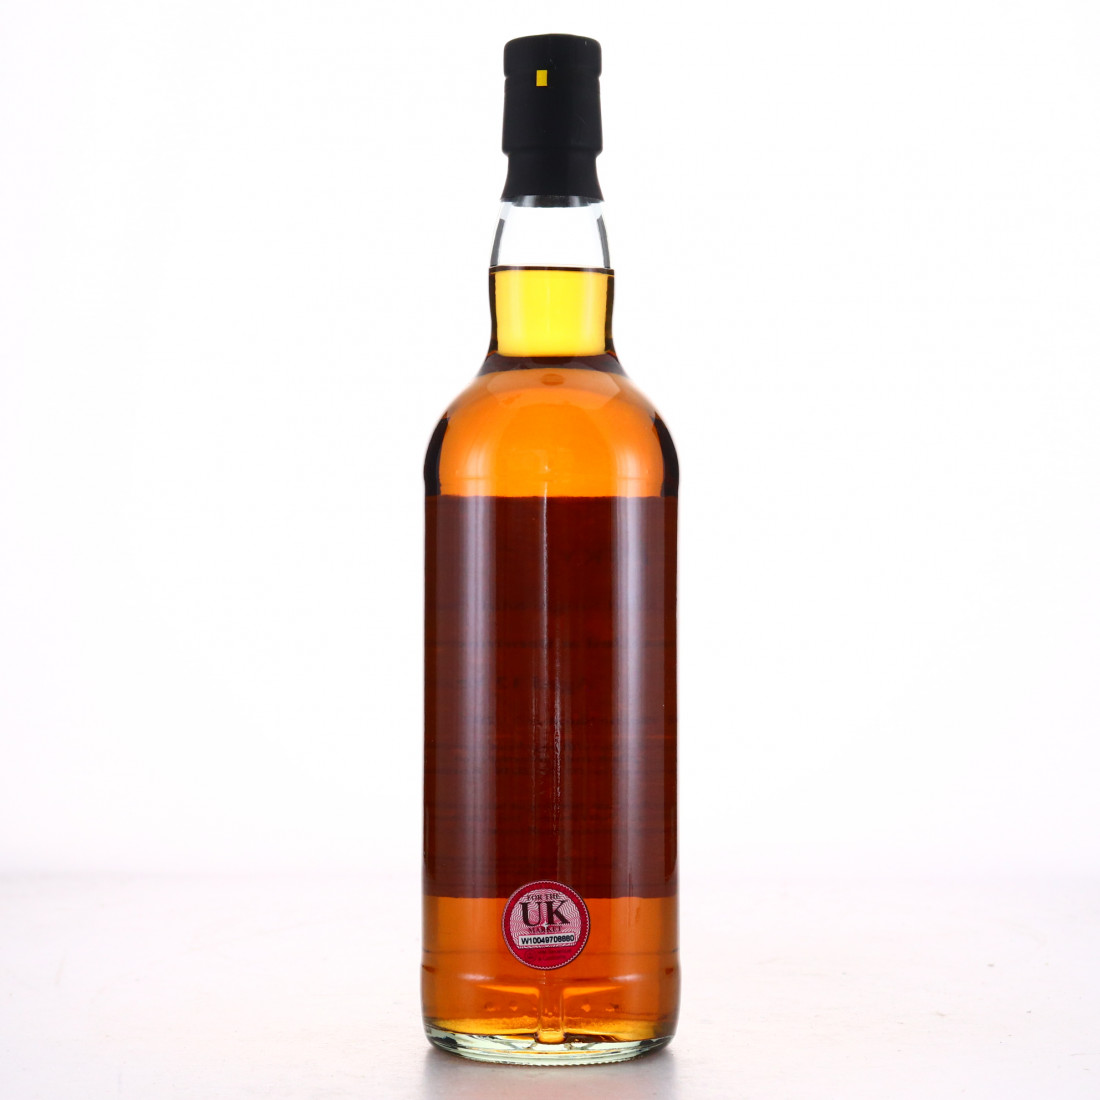 Benrinnes 2008 Whisky Broker 12 Year Old